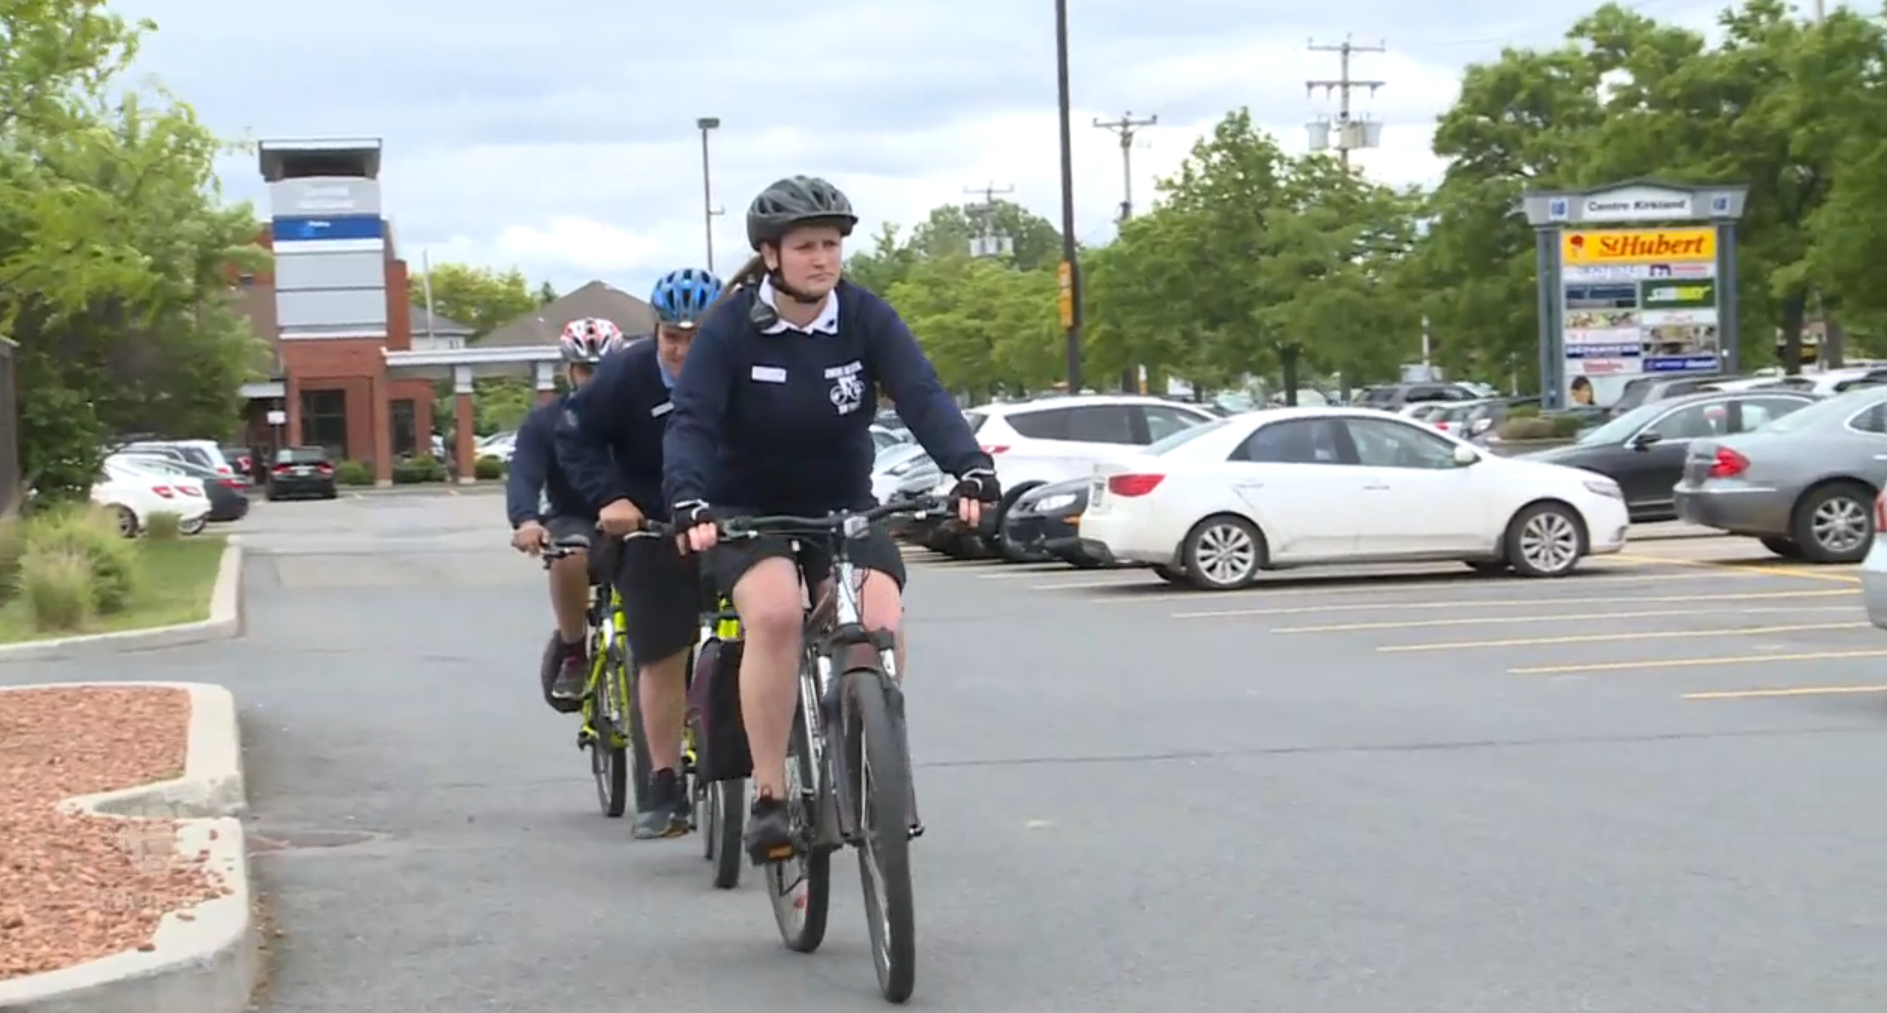 Sun Youth bike patrols take to the streets